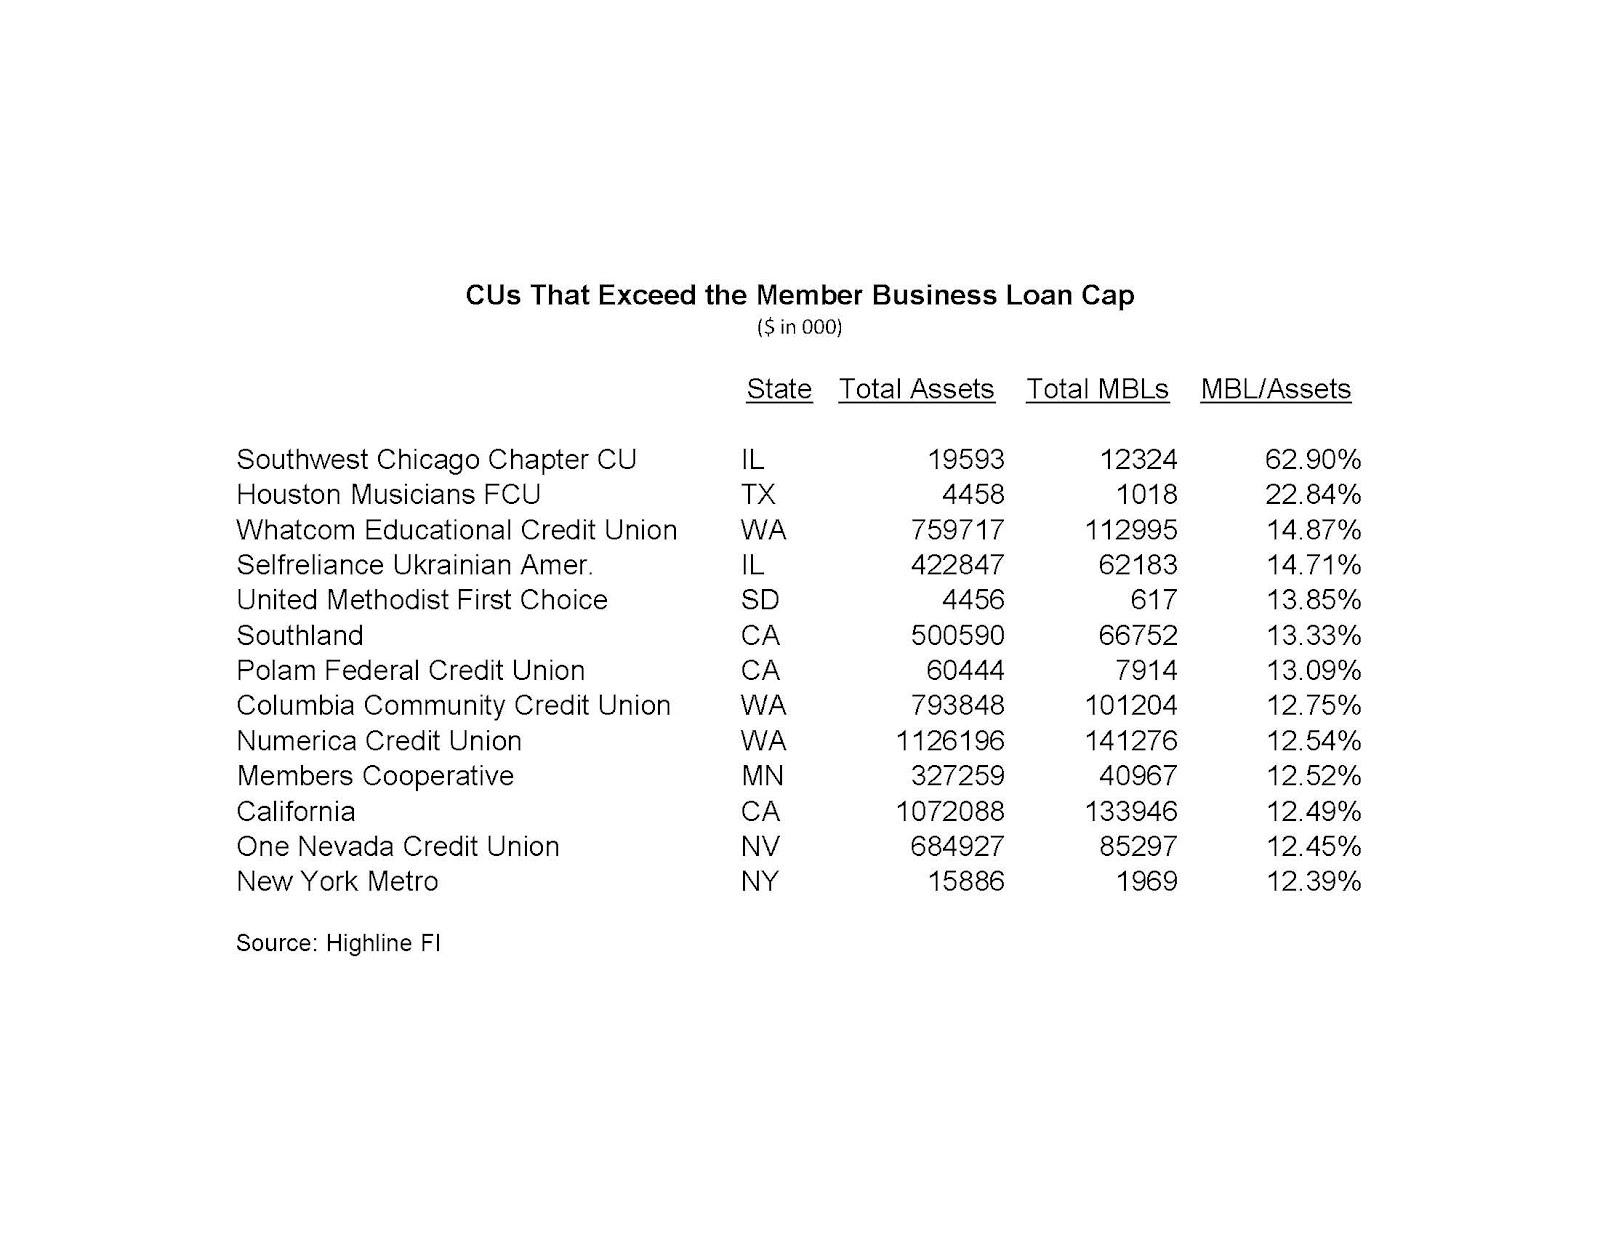 Keith Leggett's Credit Union Watch: Exceeding the MBL Cap